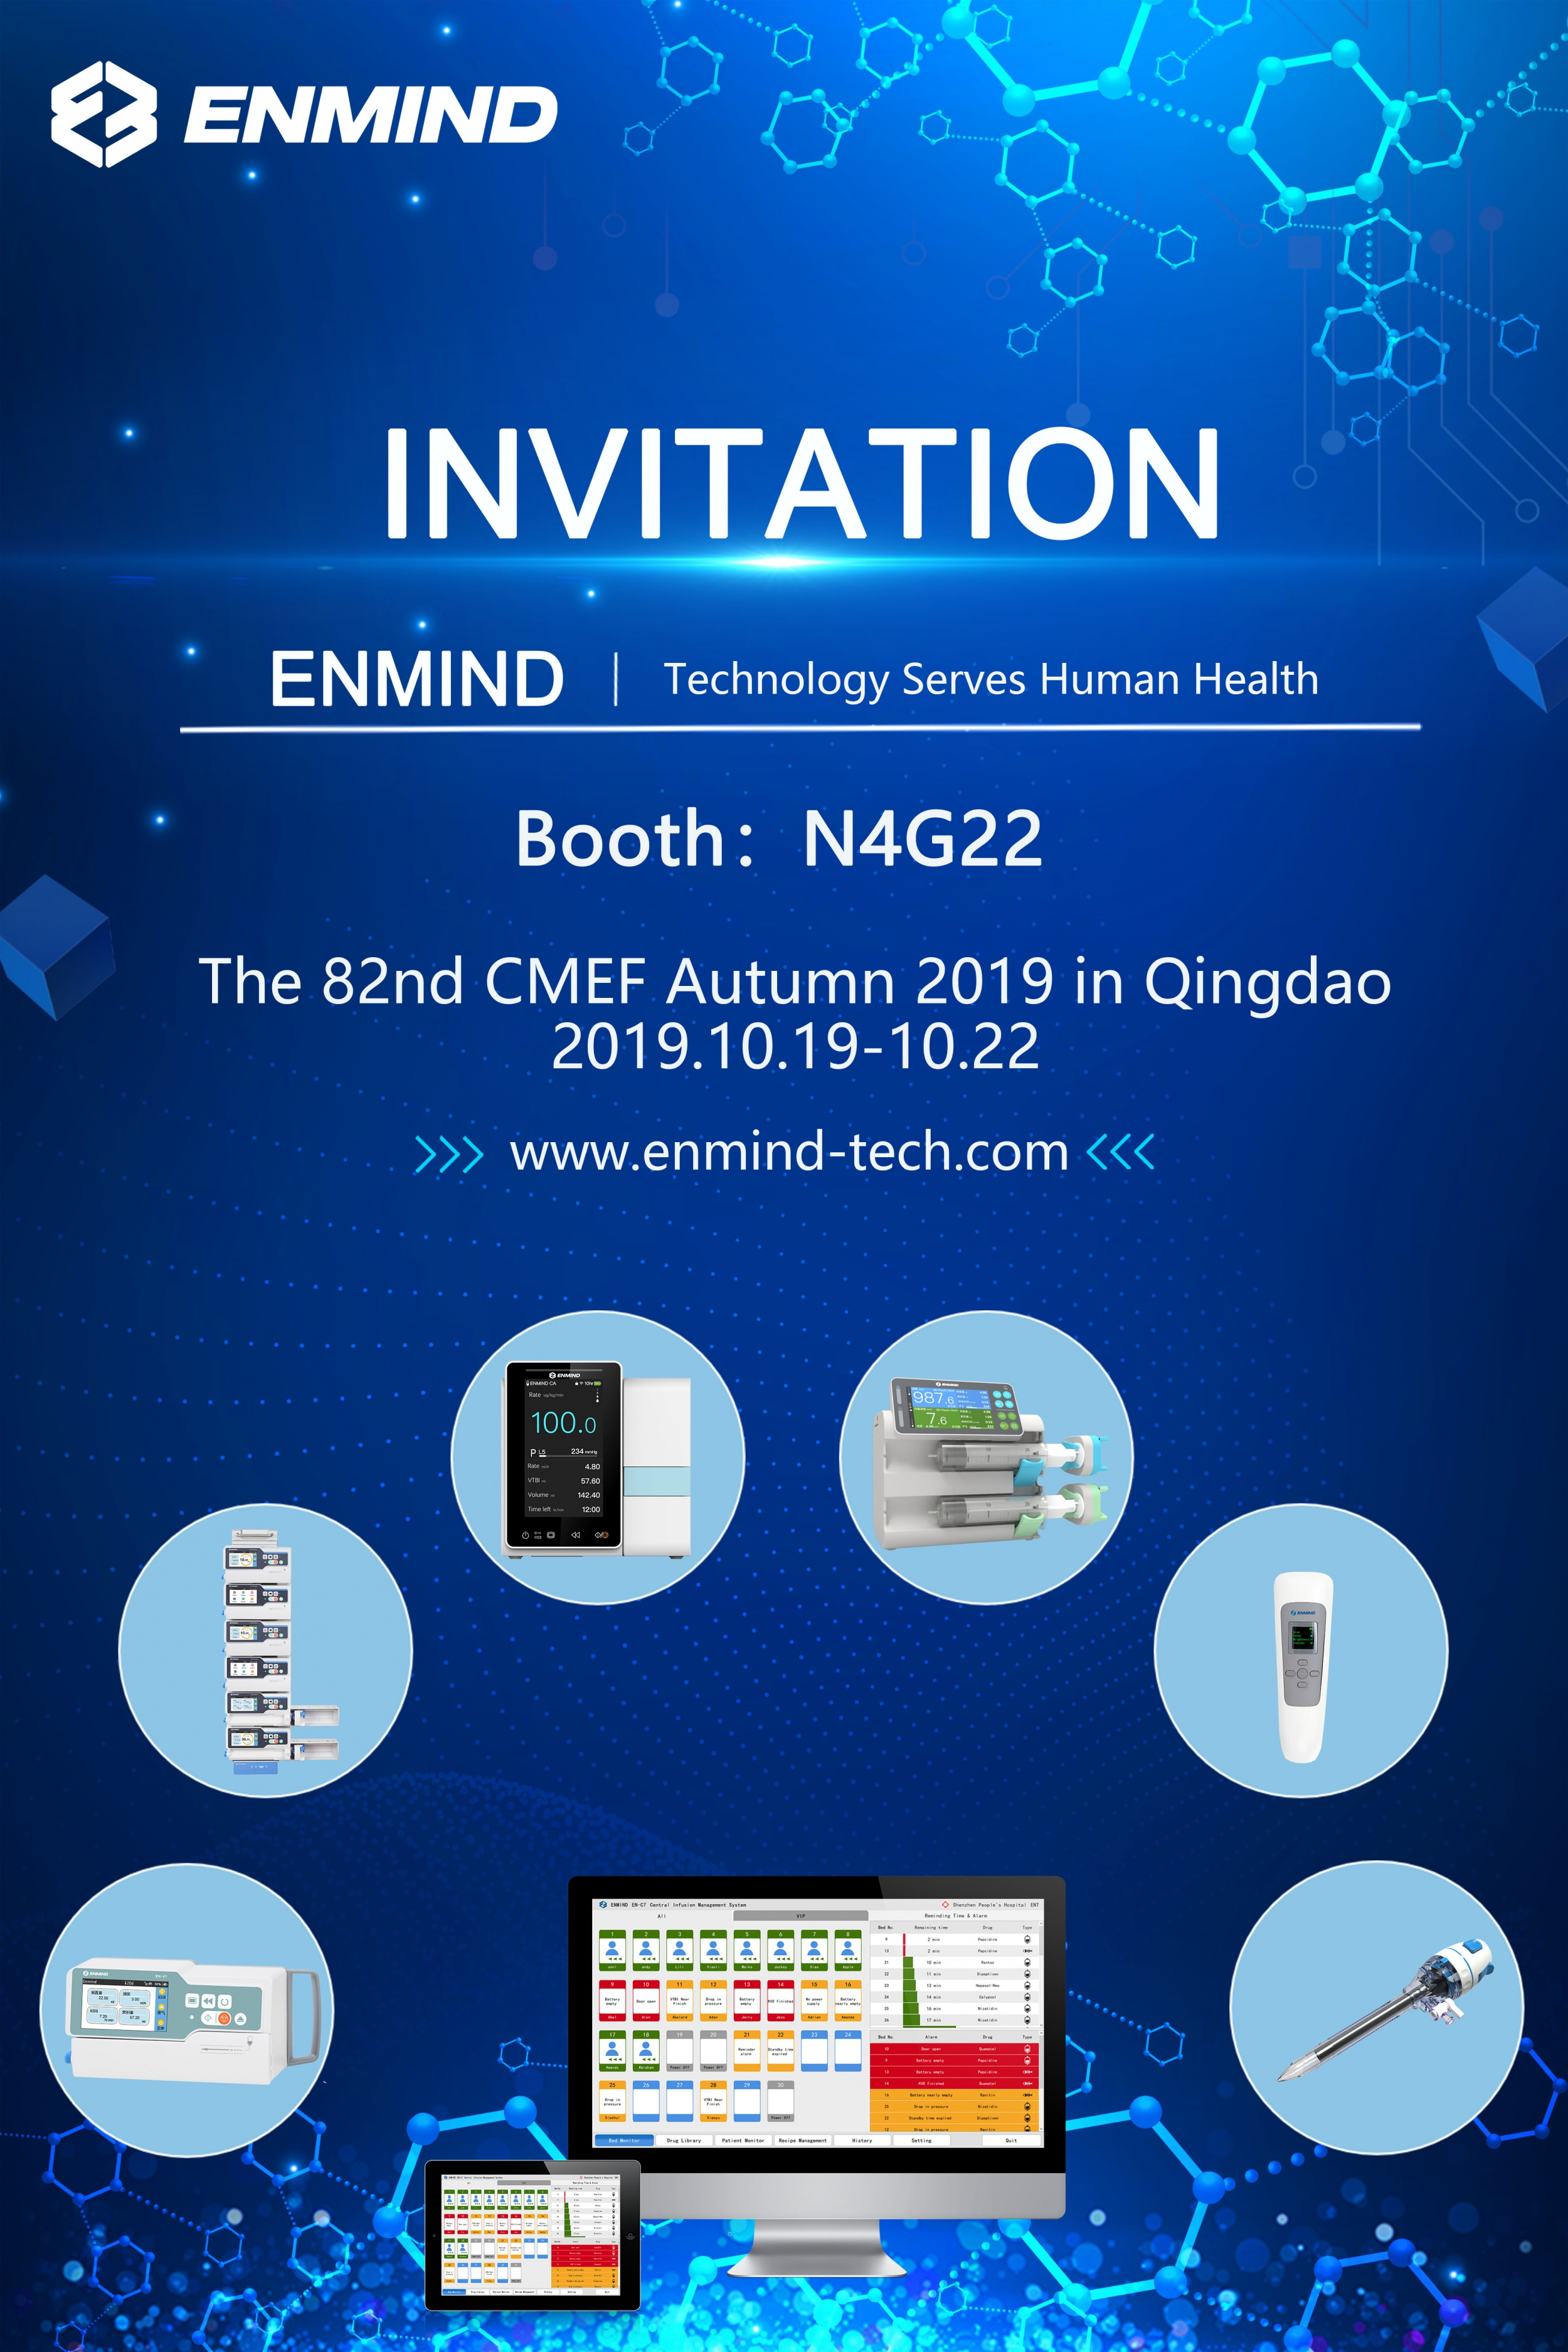 The CMEF Autumn 2019